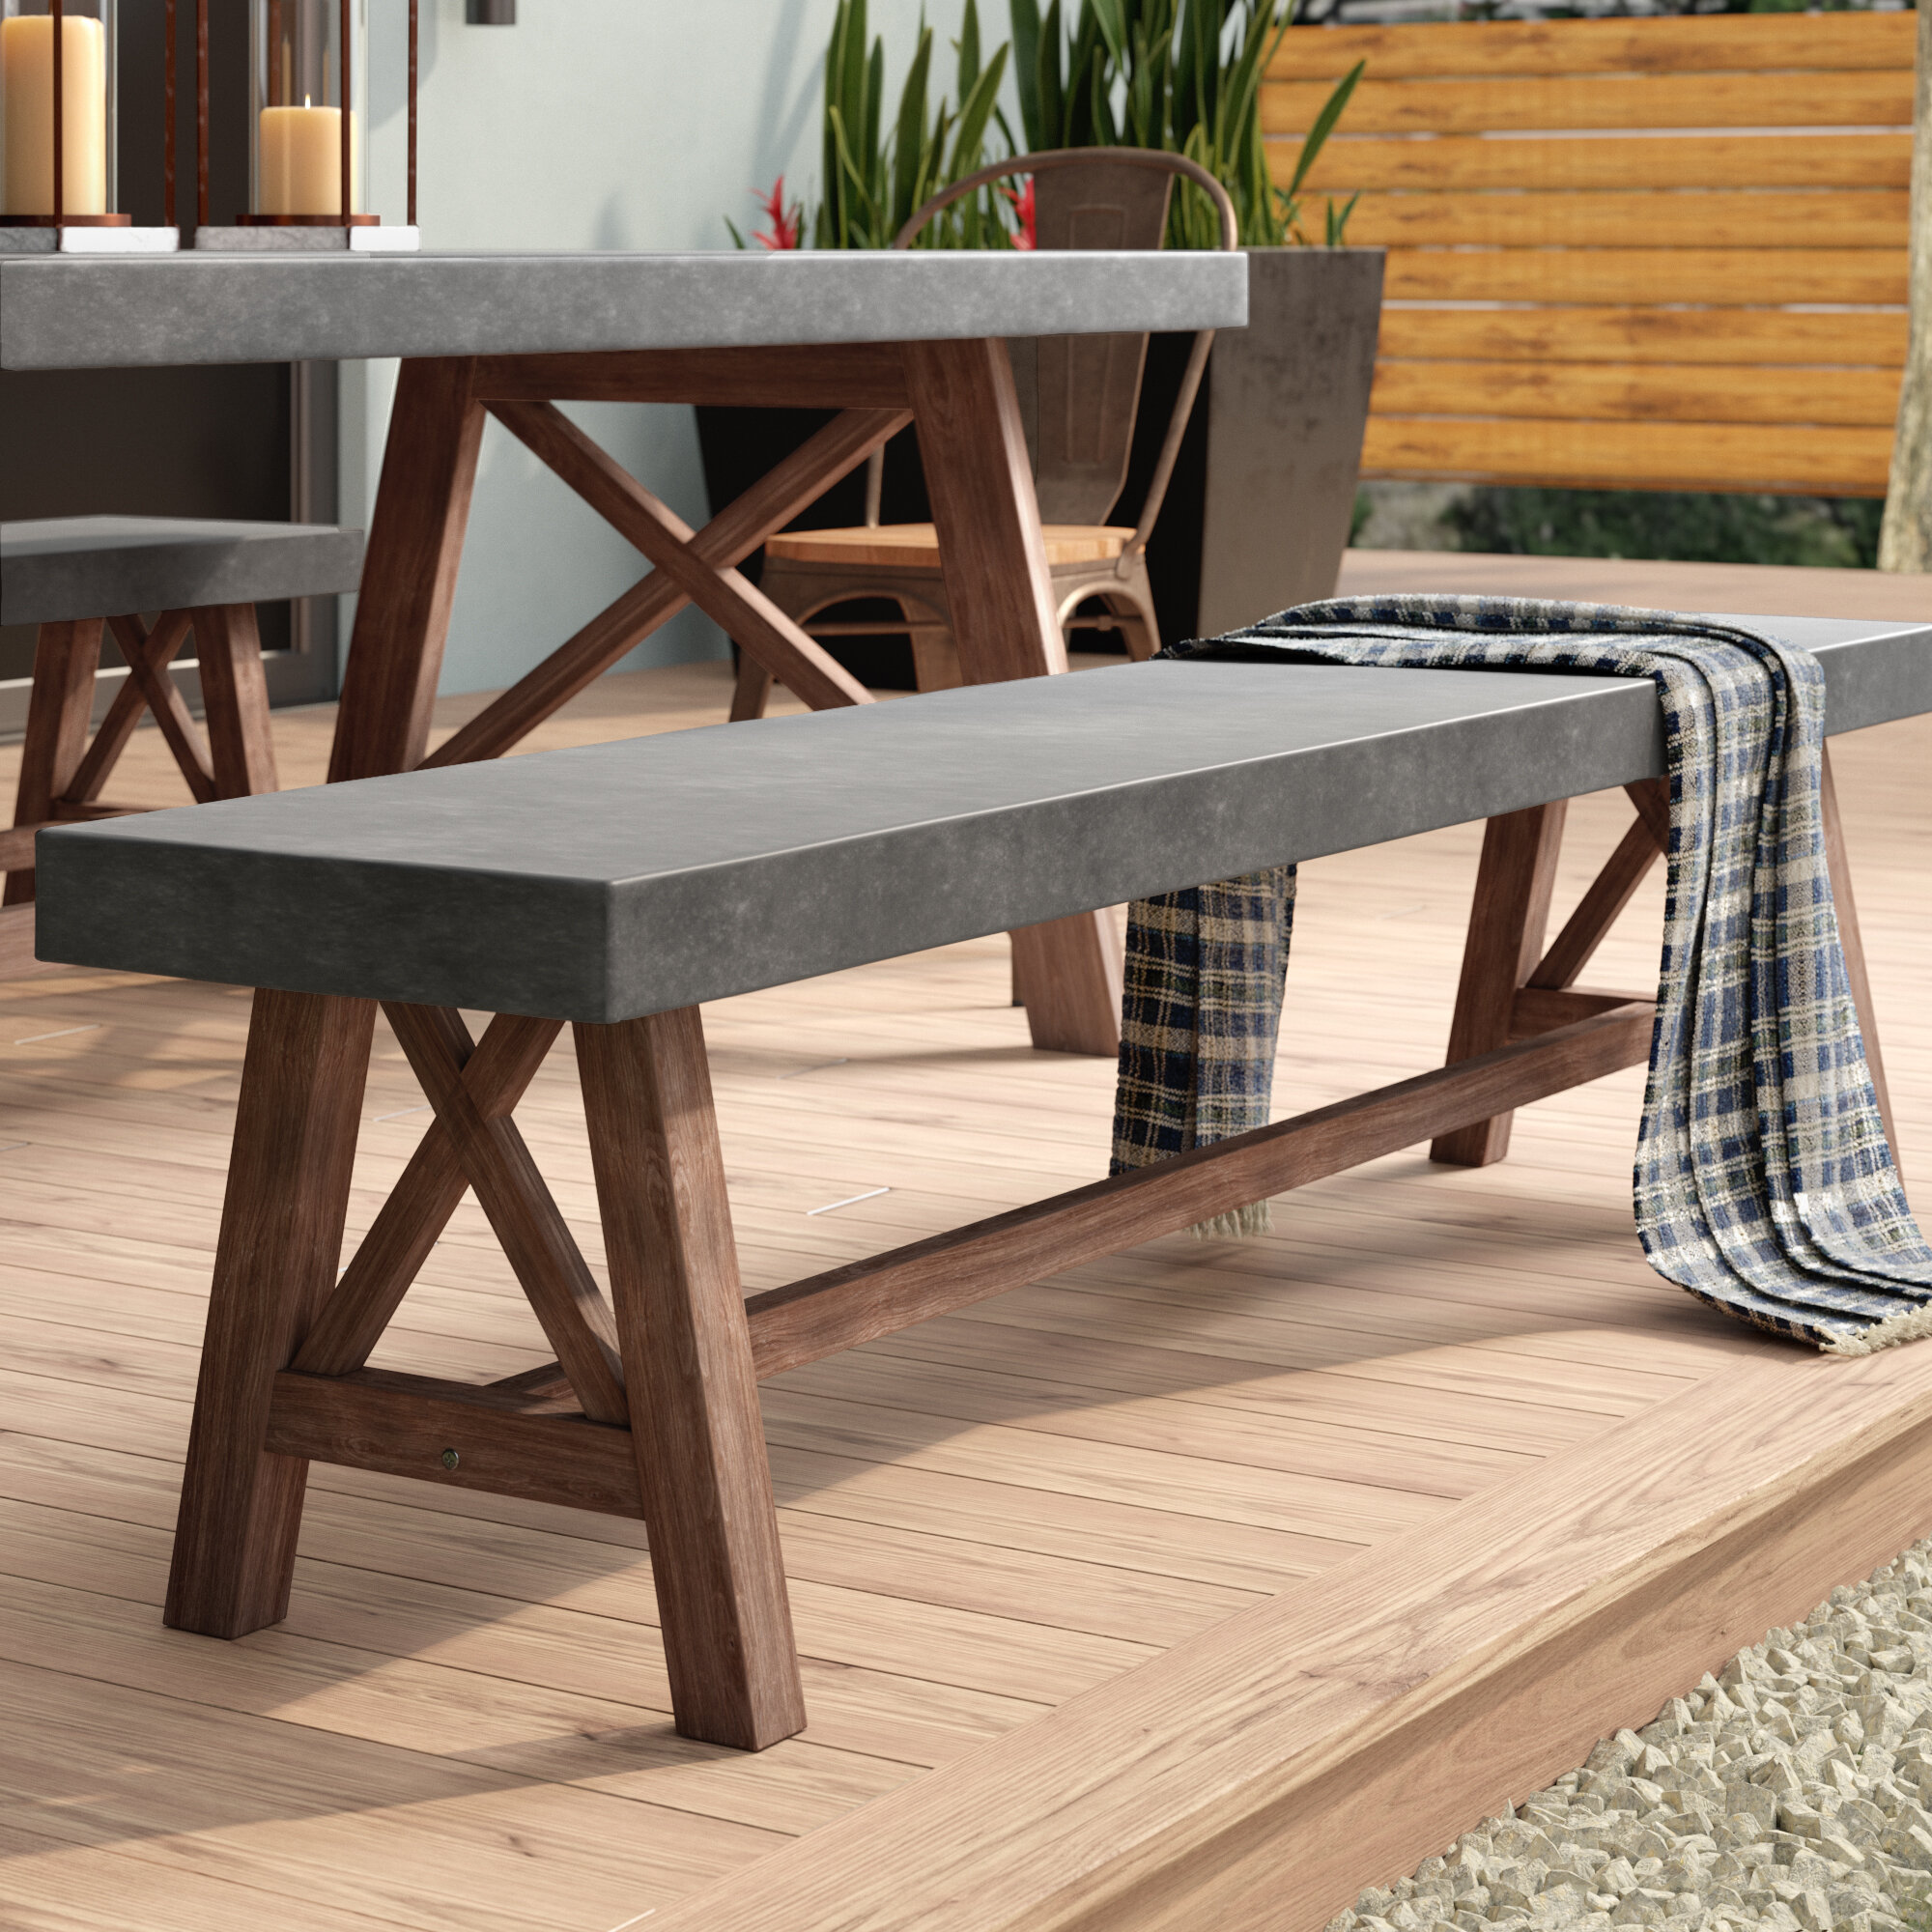 Outstanding Trent Austin Design Shoreham Wood Dining Bench Reviews Evergreenethics Interior Chair Design Evergreenethicsorg